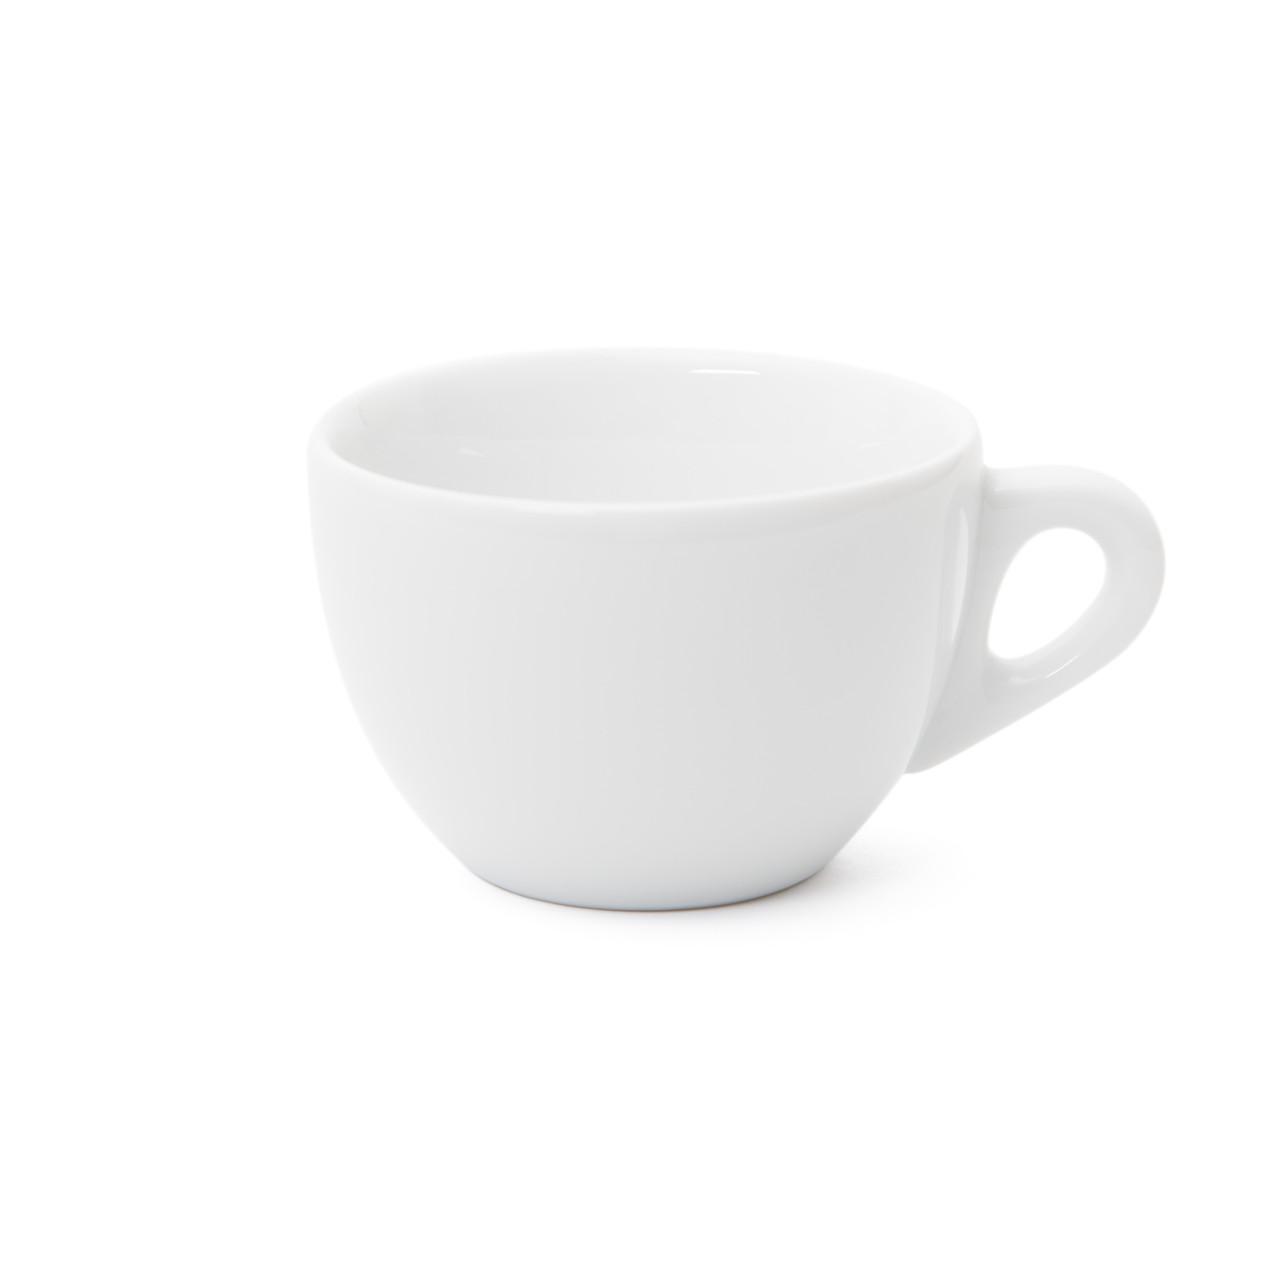 Чашка 260 мл. фарфоровая, белая Large Cappuccino Verona Millecolori, Ancap